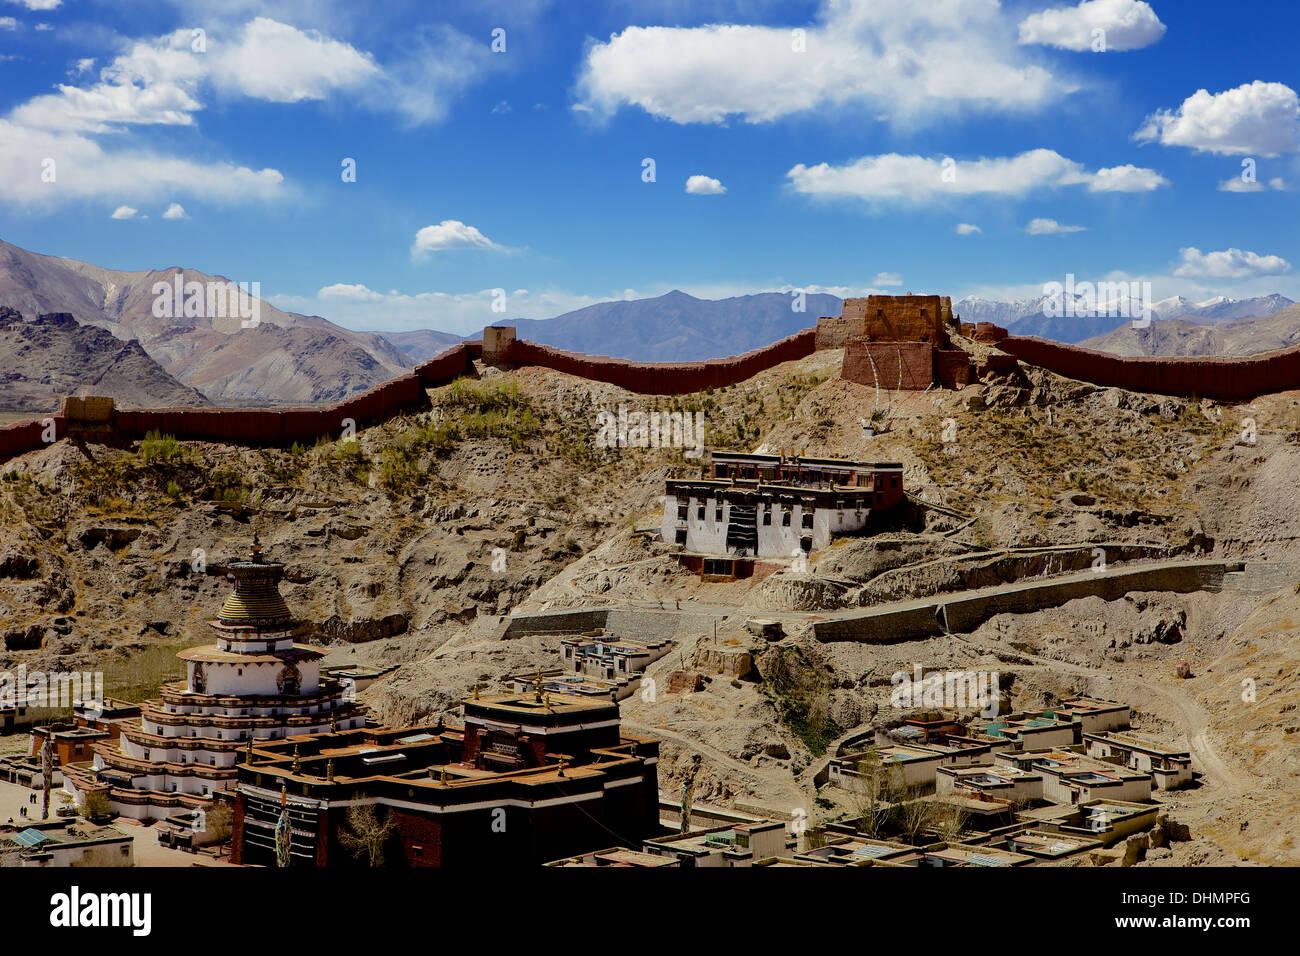 View of the Kumbum chorten (Stupa) & Palcho Monastery, Gyantse, Tibet, China, Asia Stock Photo